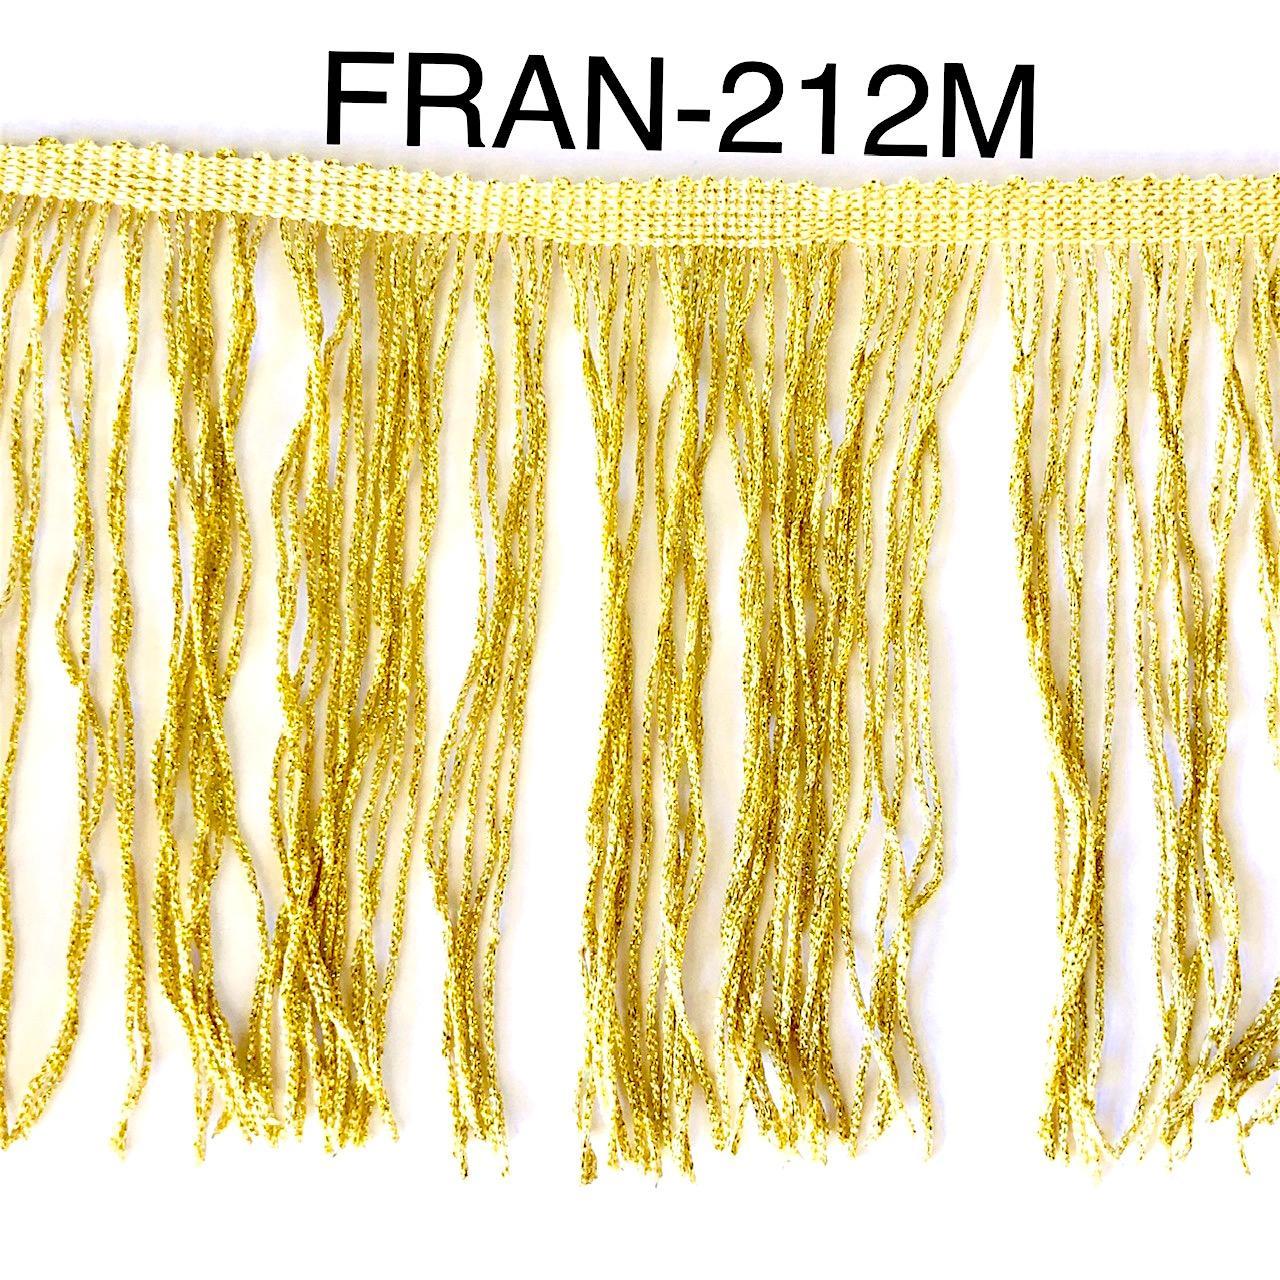 Franges a coudre brillante 15cm or dore